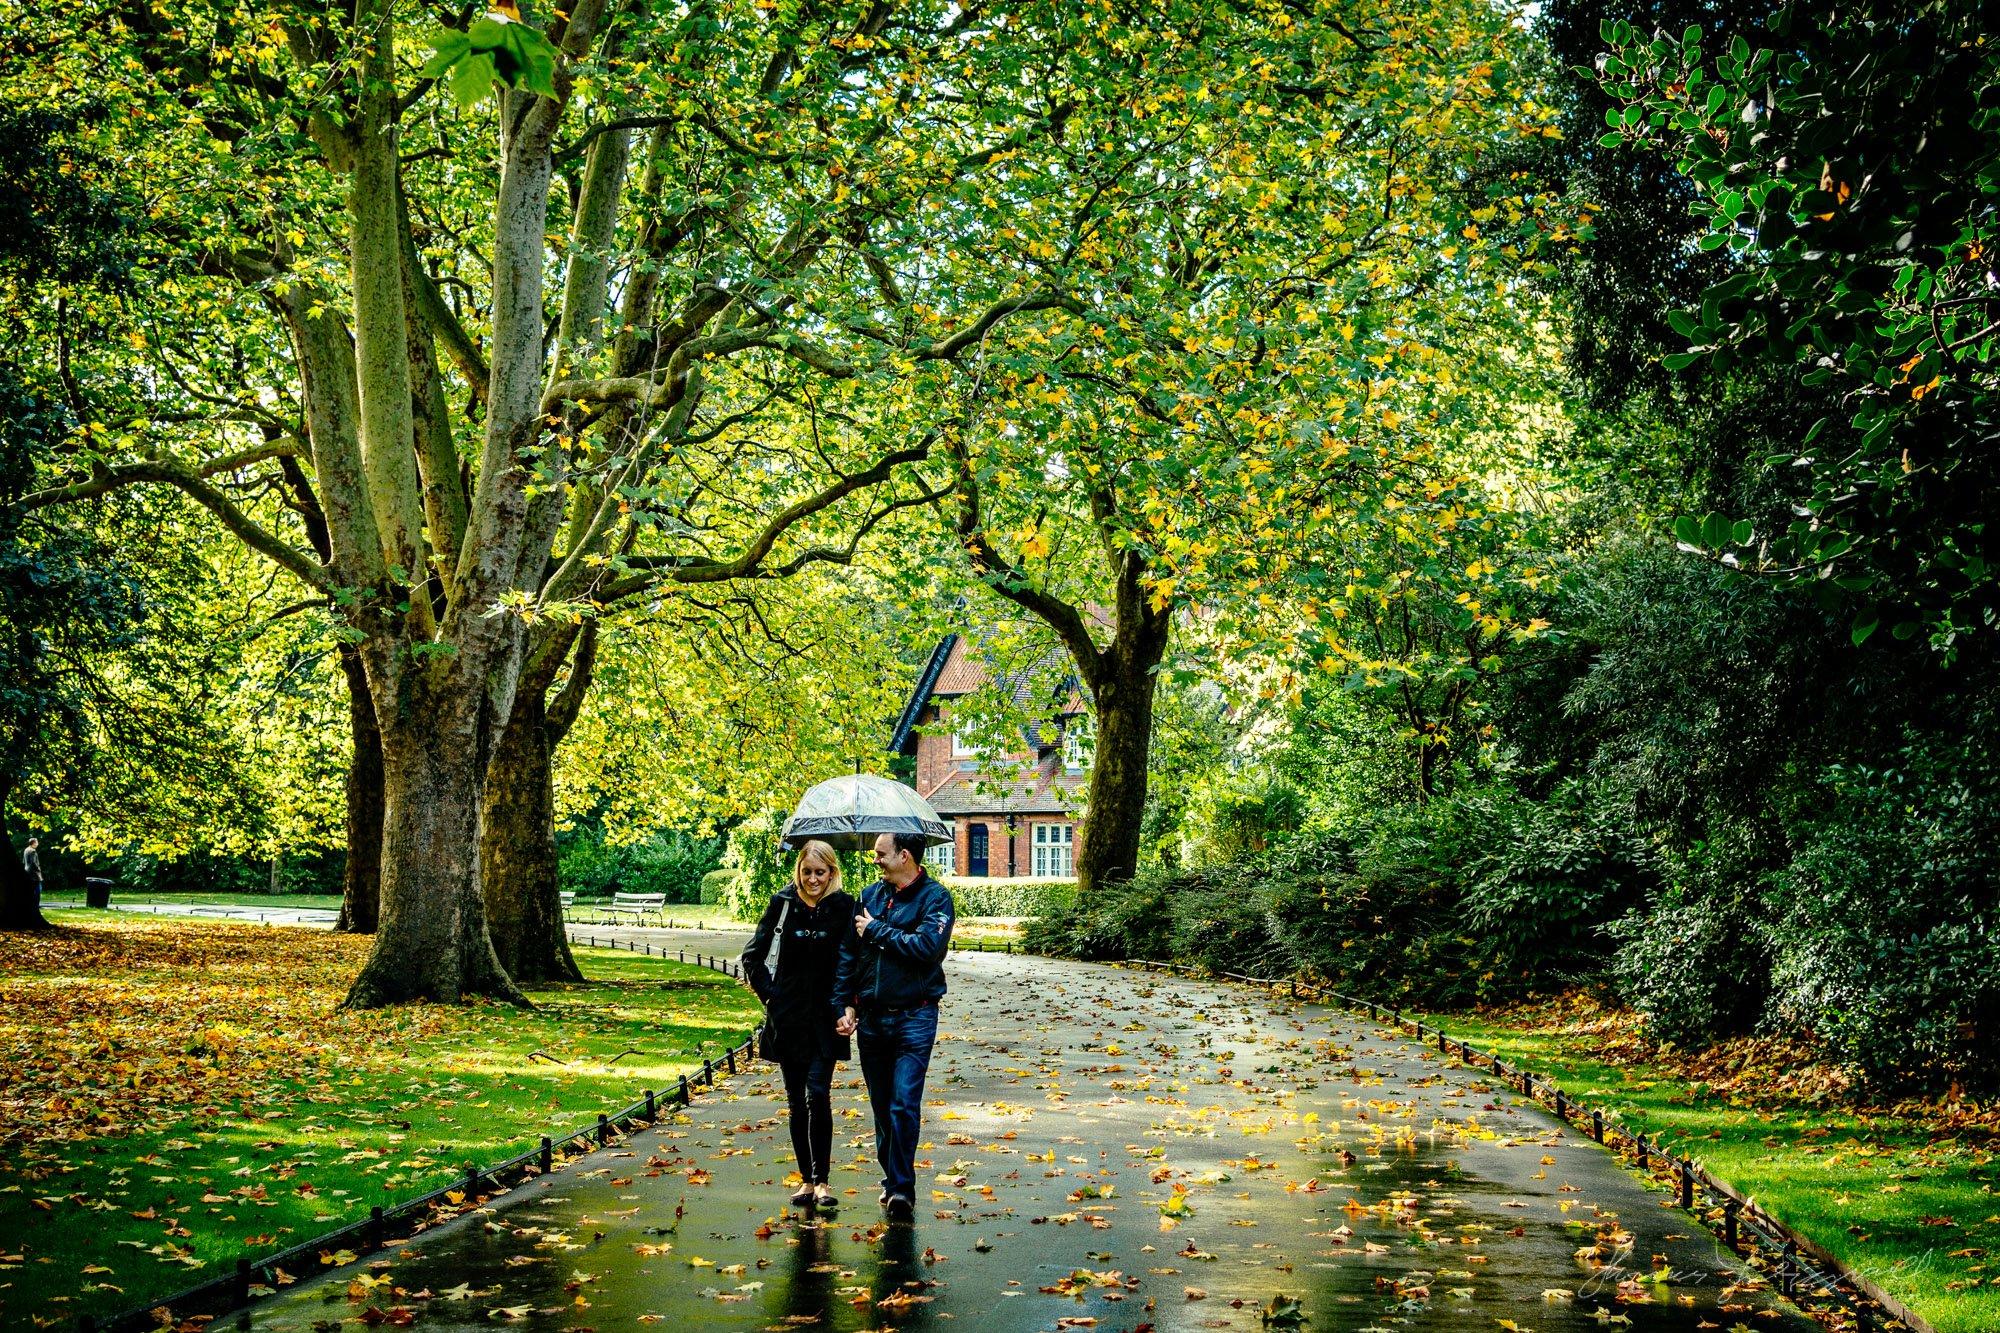 A Couple enjoys A Rainy Autumn Day in Stephen's Green